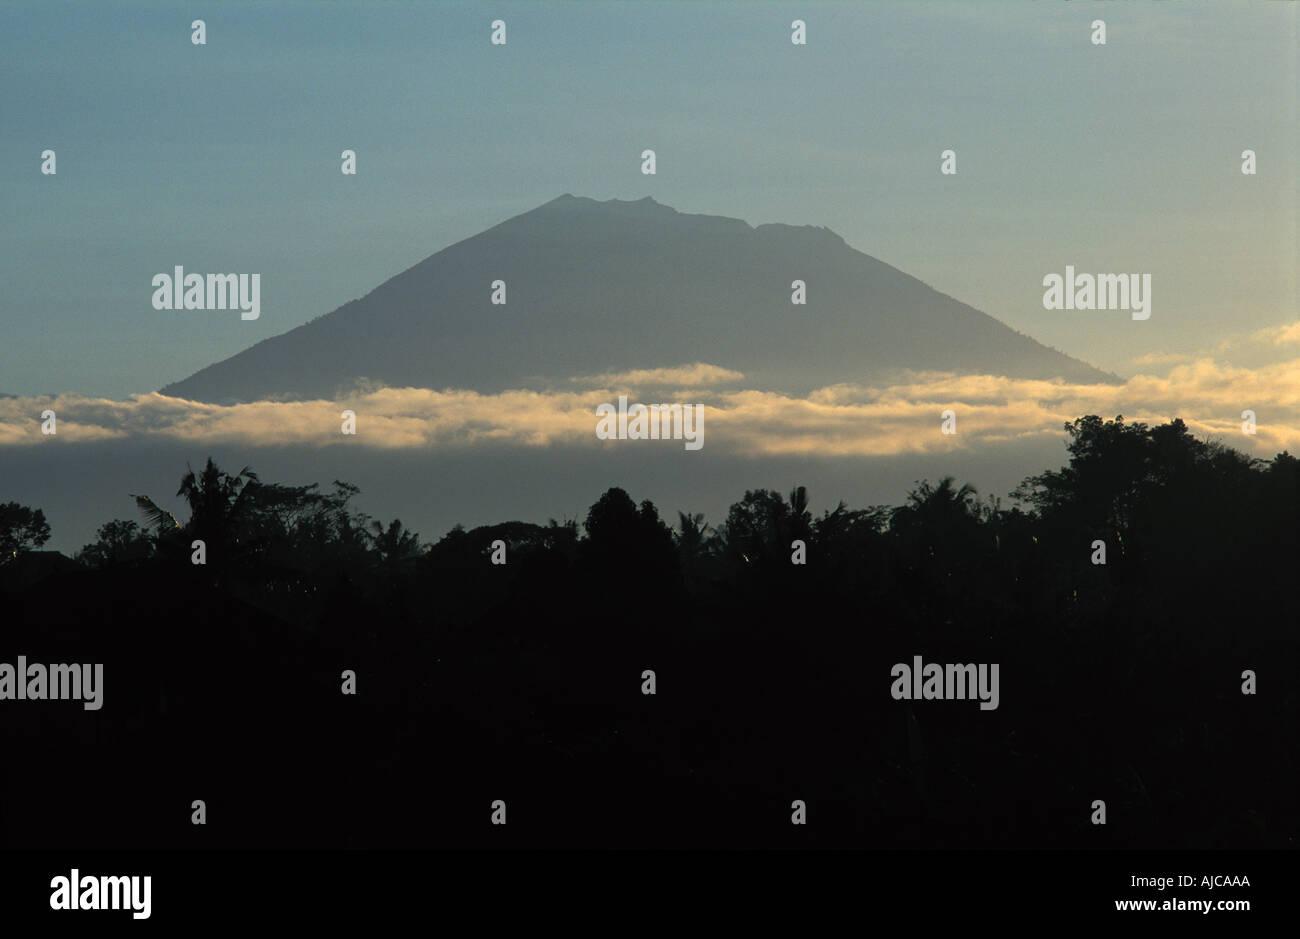 Gunung Batukau Central Bali Indonesia Viewed from Ubud at dawn Stock Photo